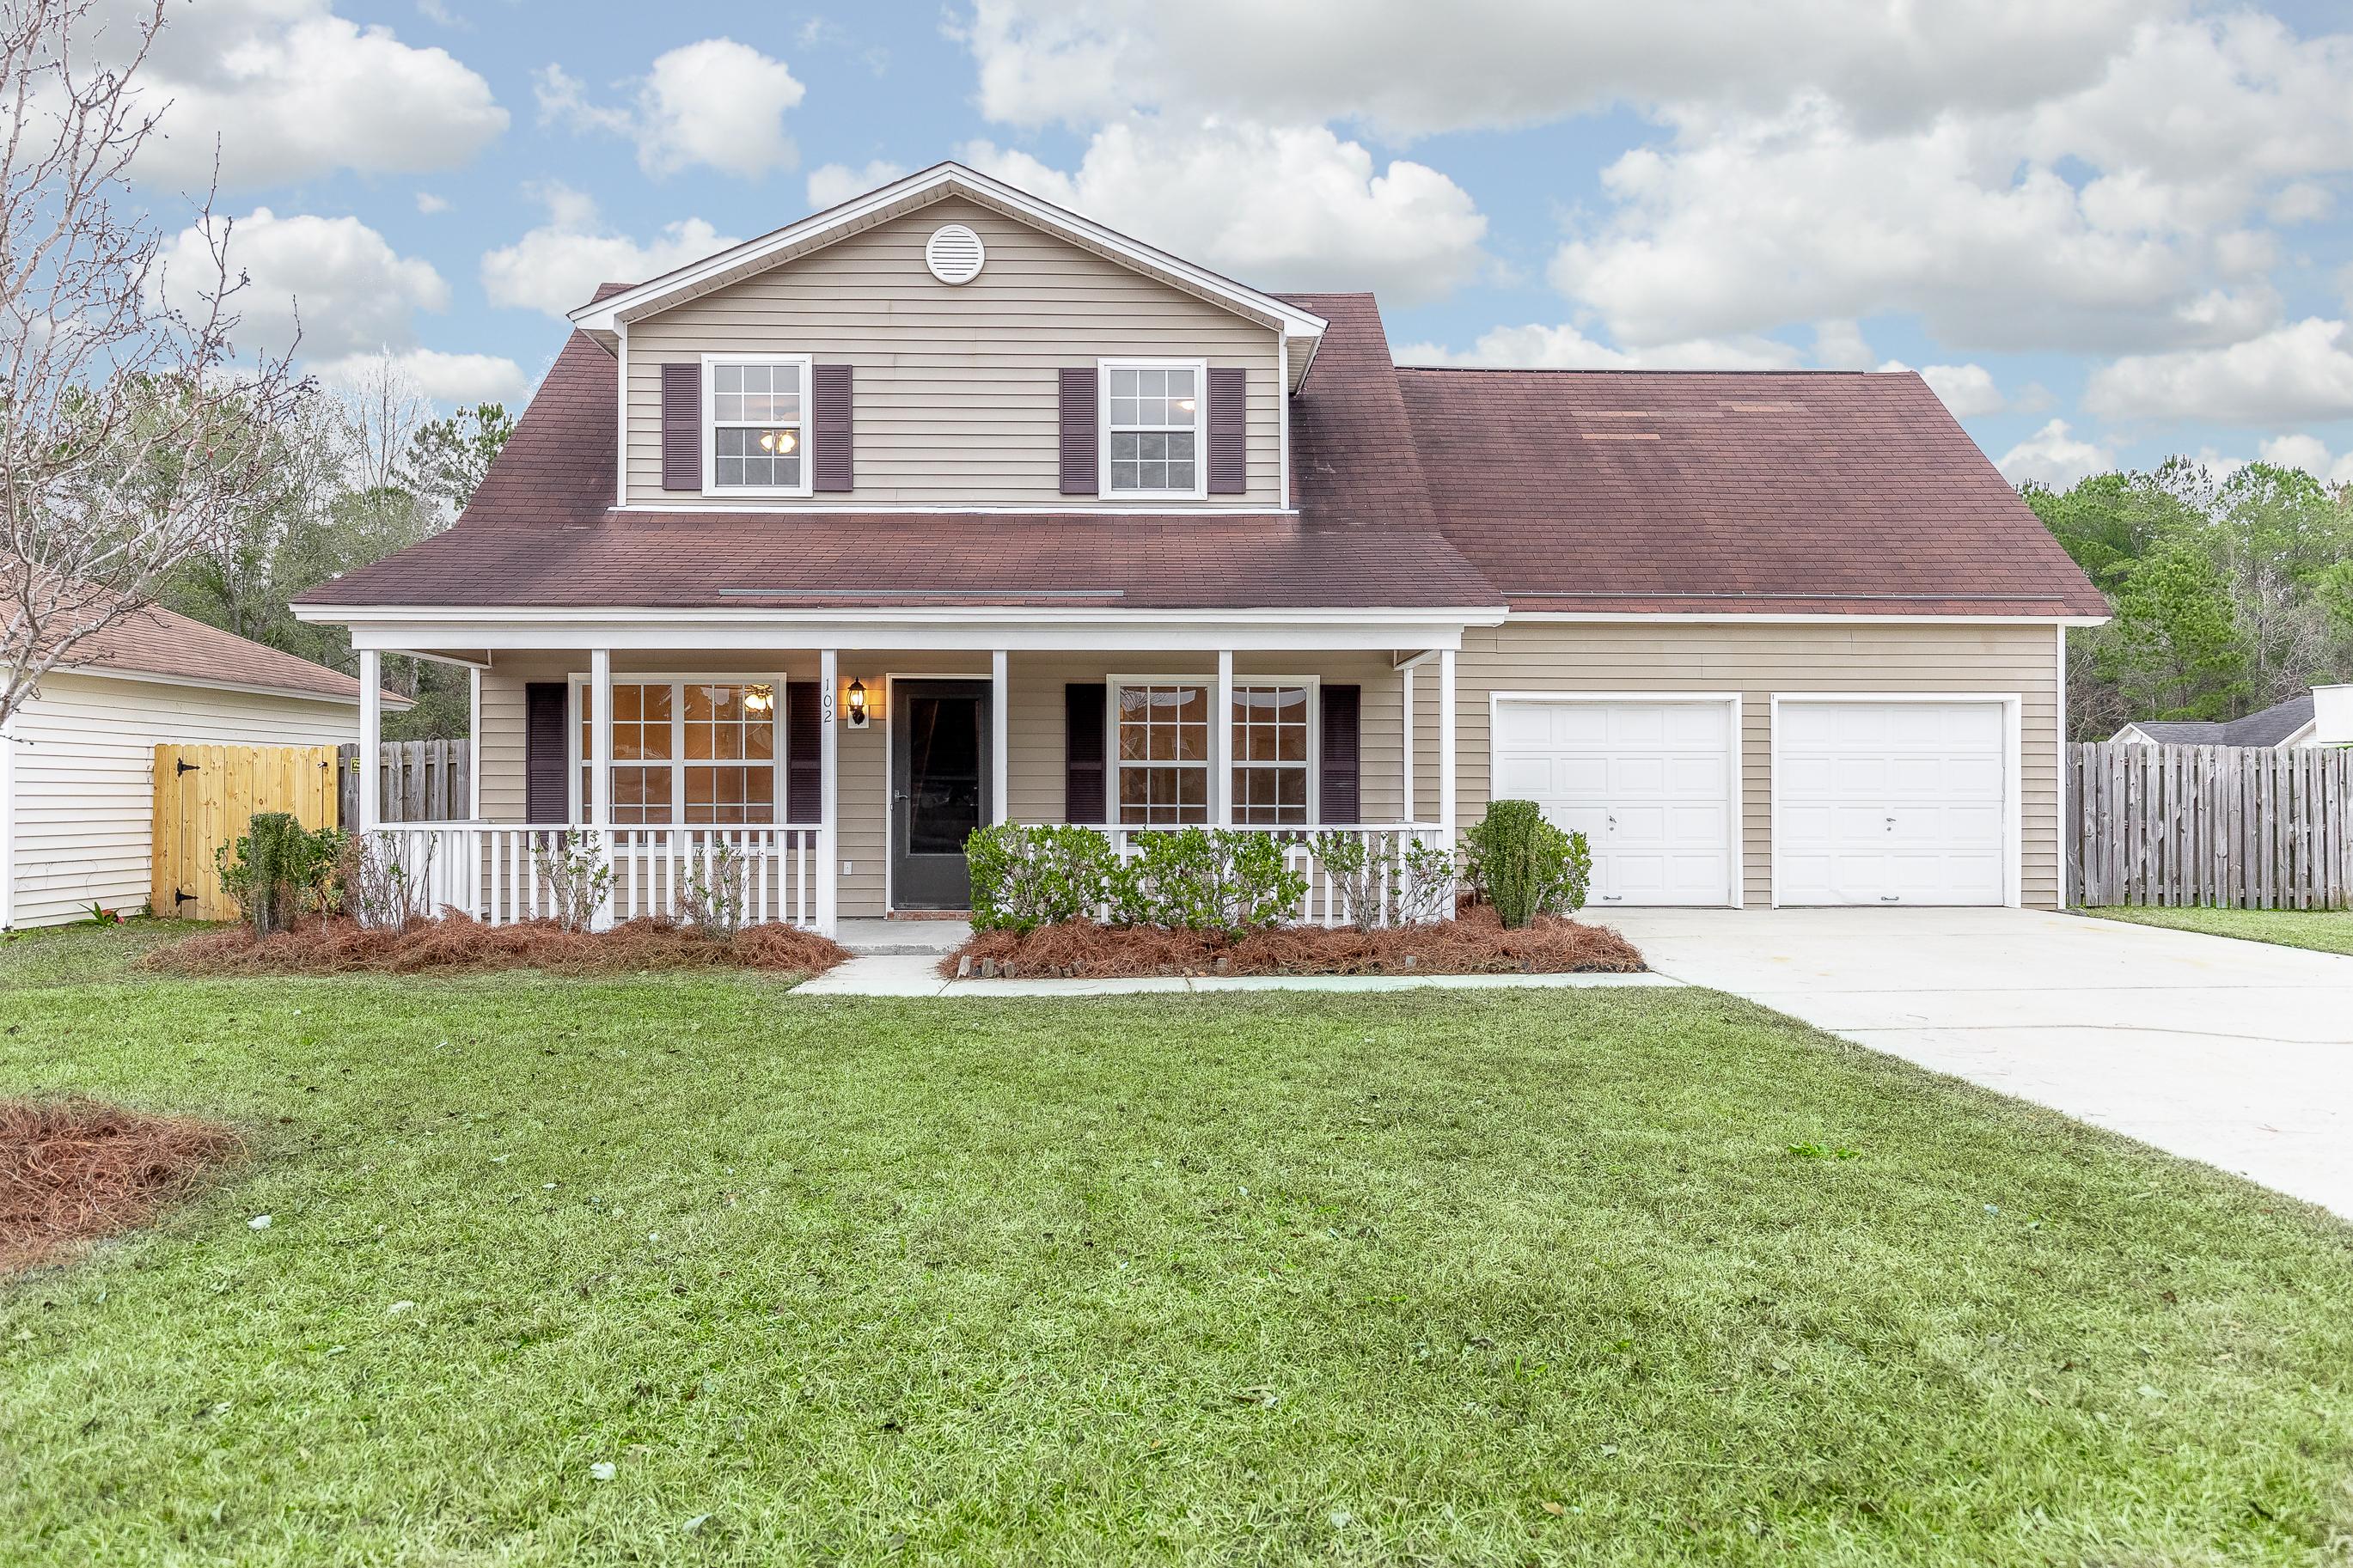 102 Ridgecrest Drive, Pooler, GA 31322